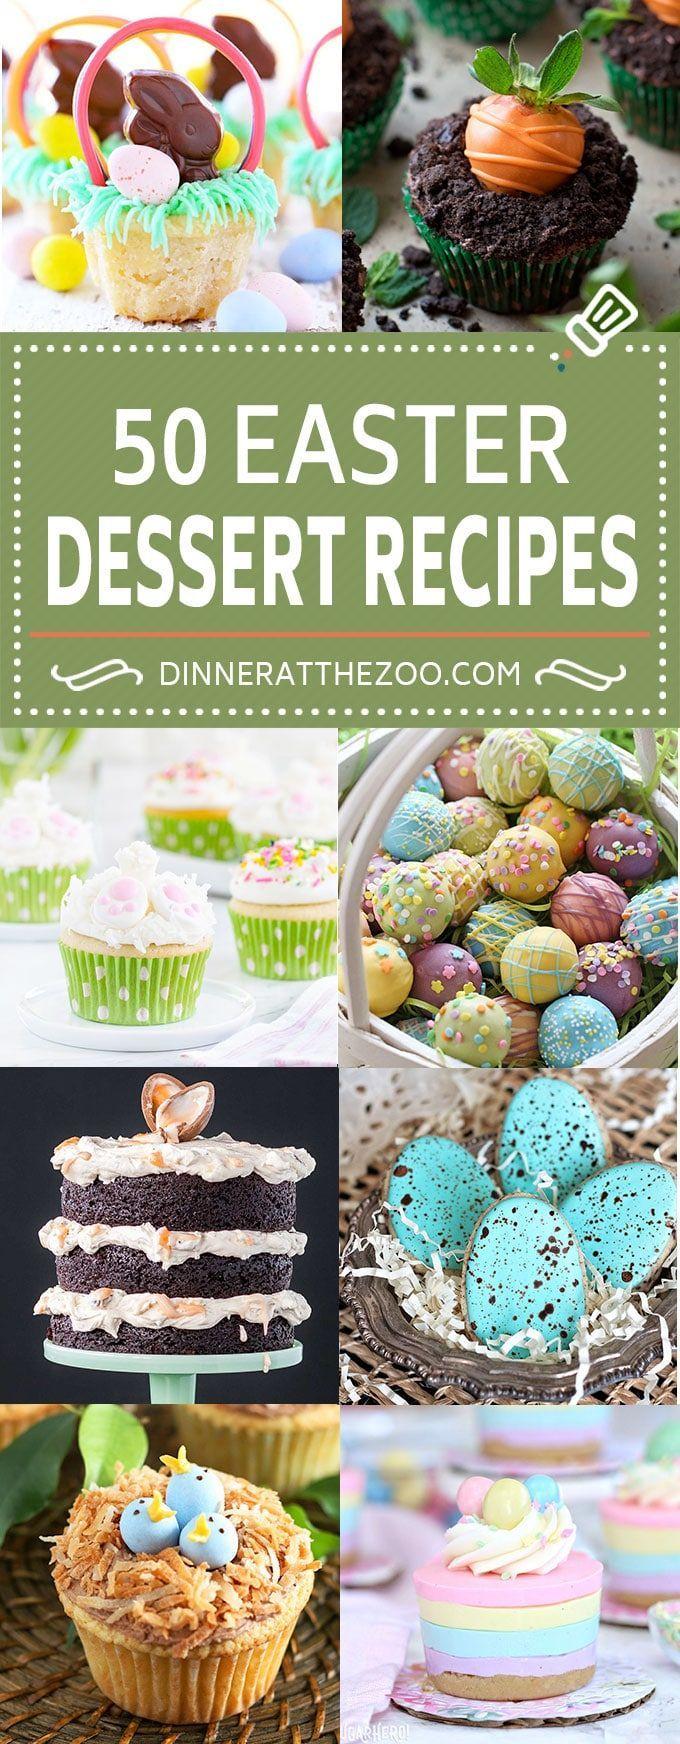 50 Easter Dessert Recipes